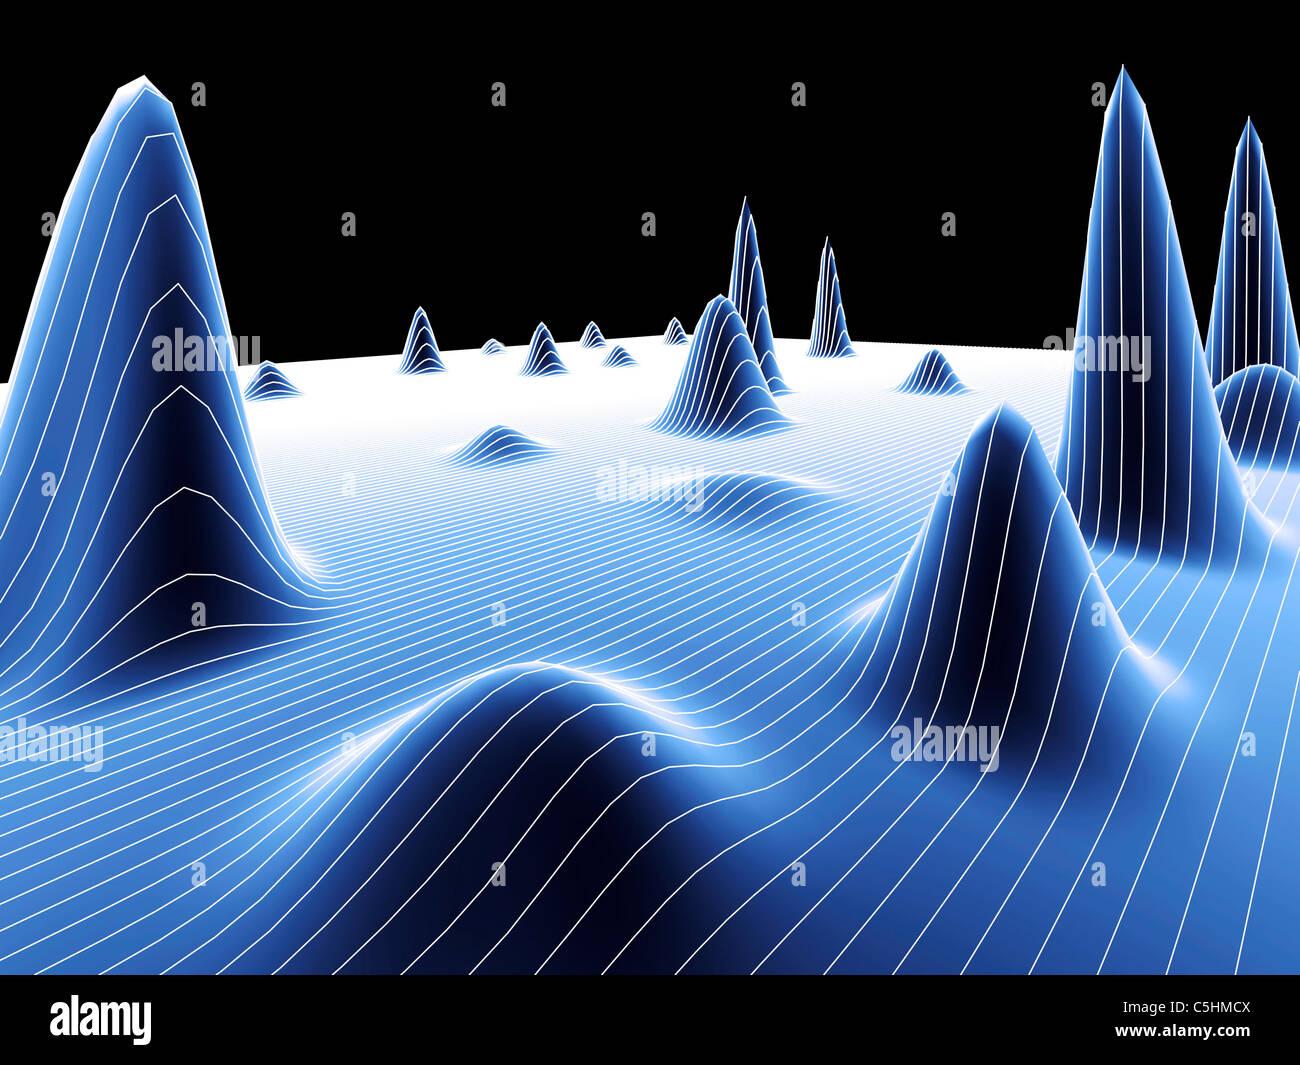 Gráfico de superficie 3D Imagen De Stock